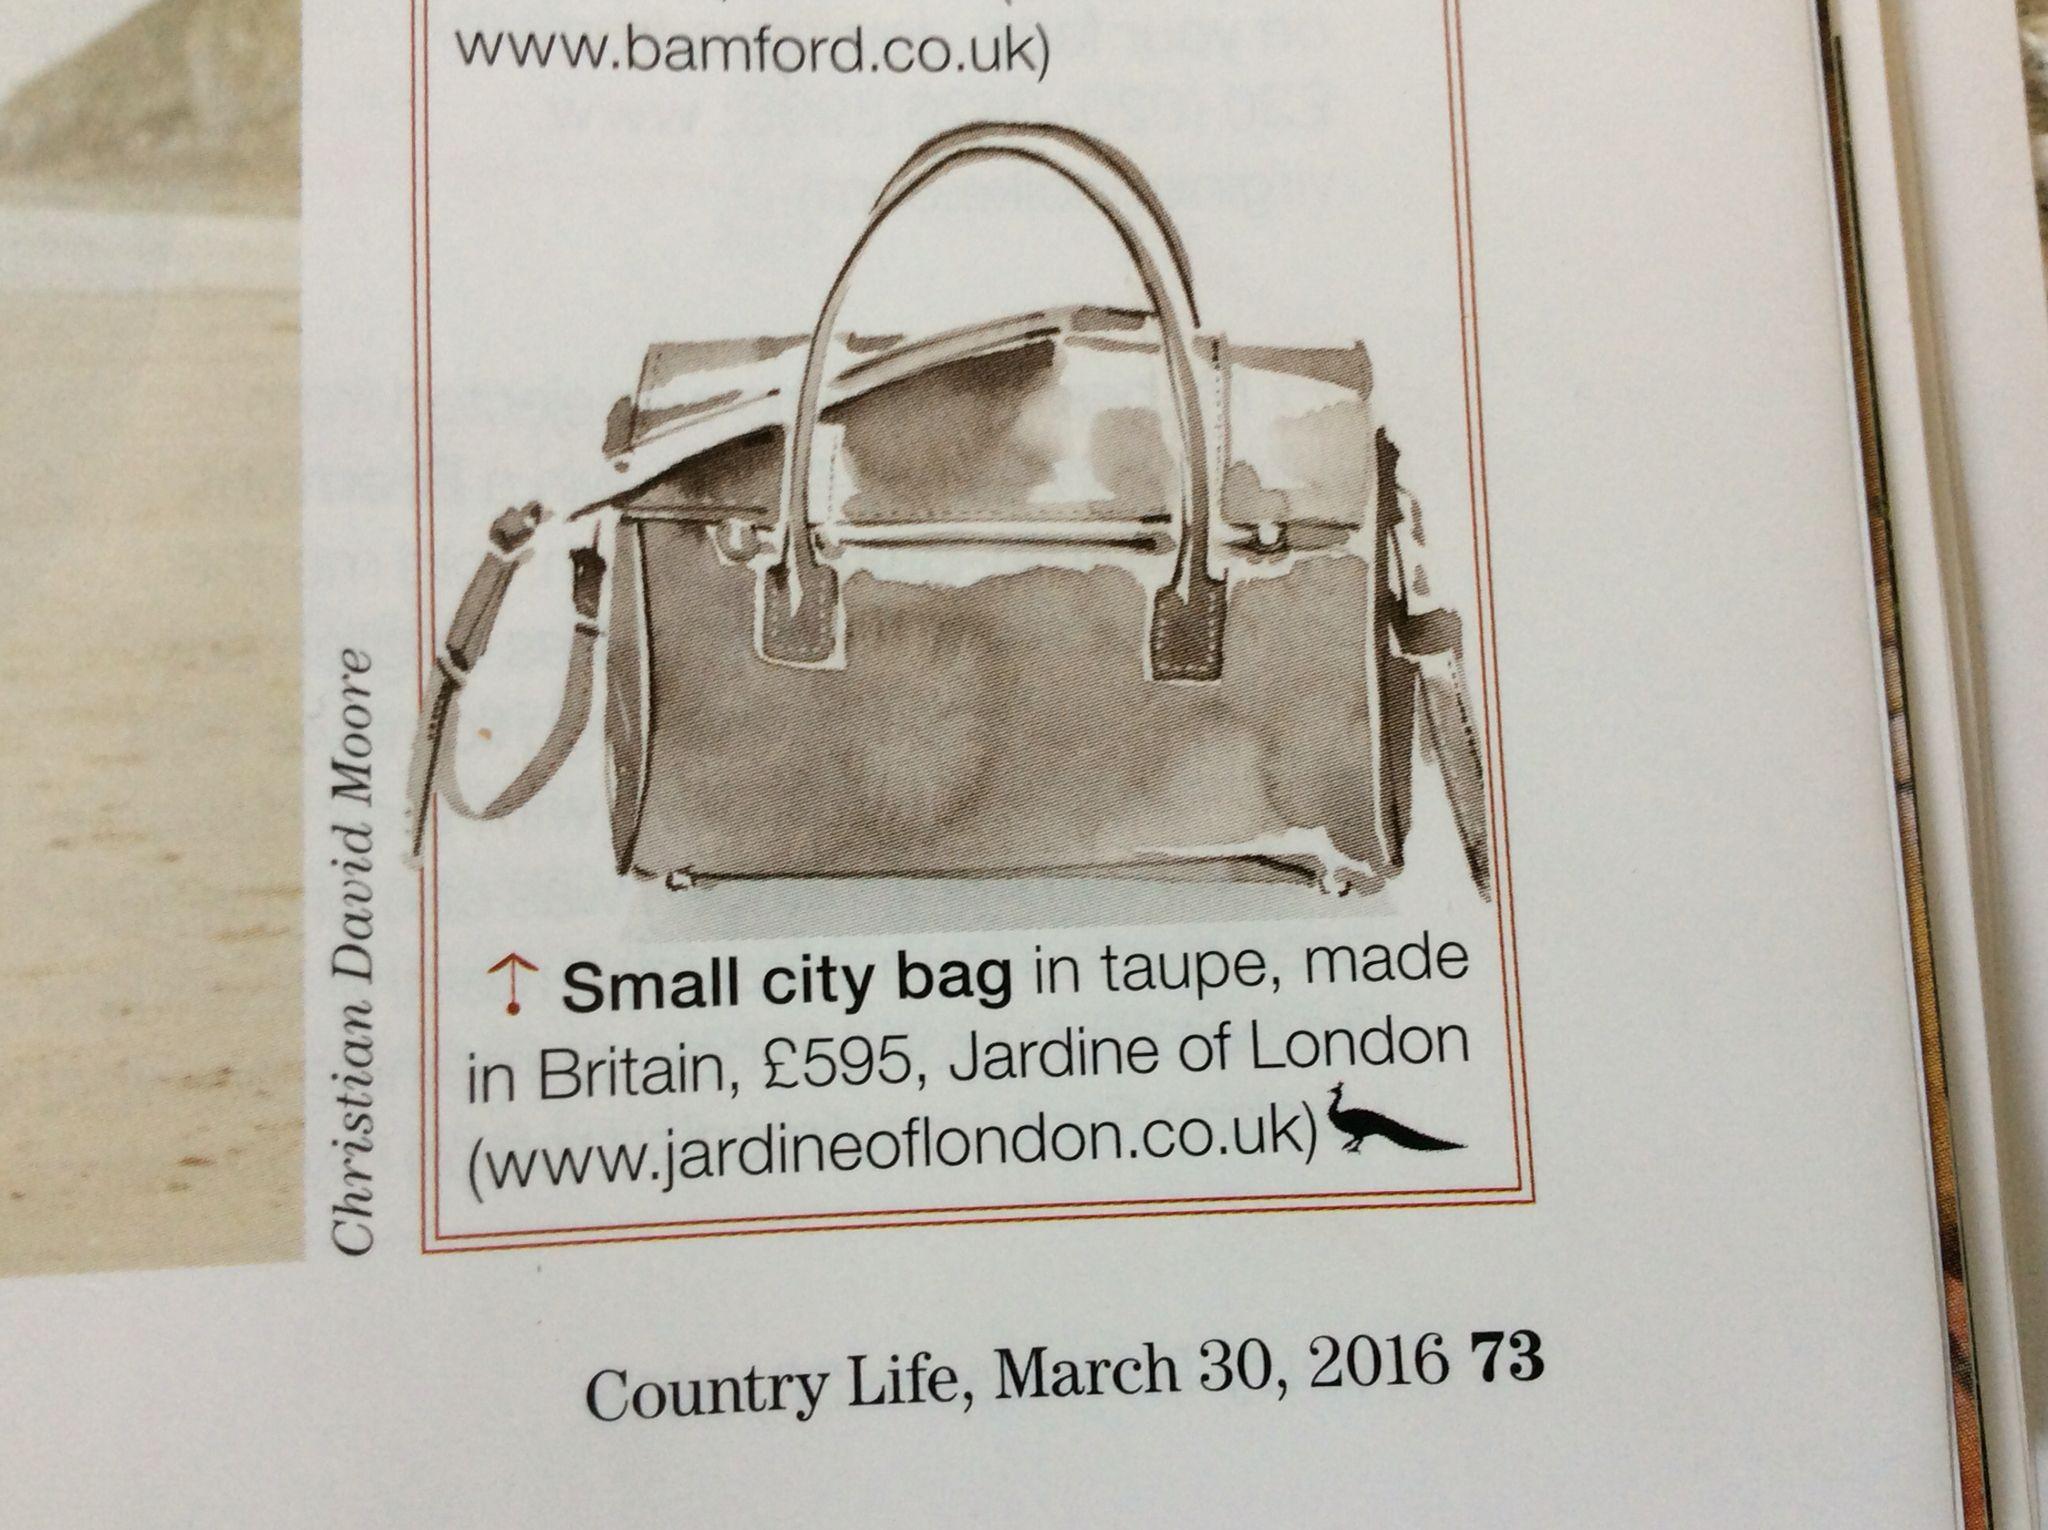 Cross Body British Luxury Leather Handbag Available From Jardineoflondon Co Uk